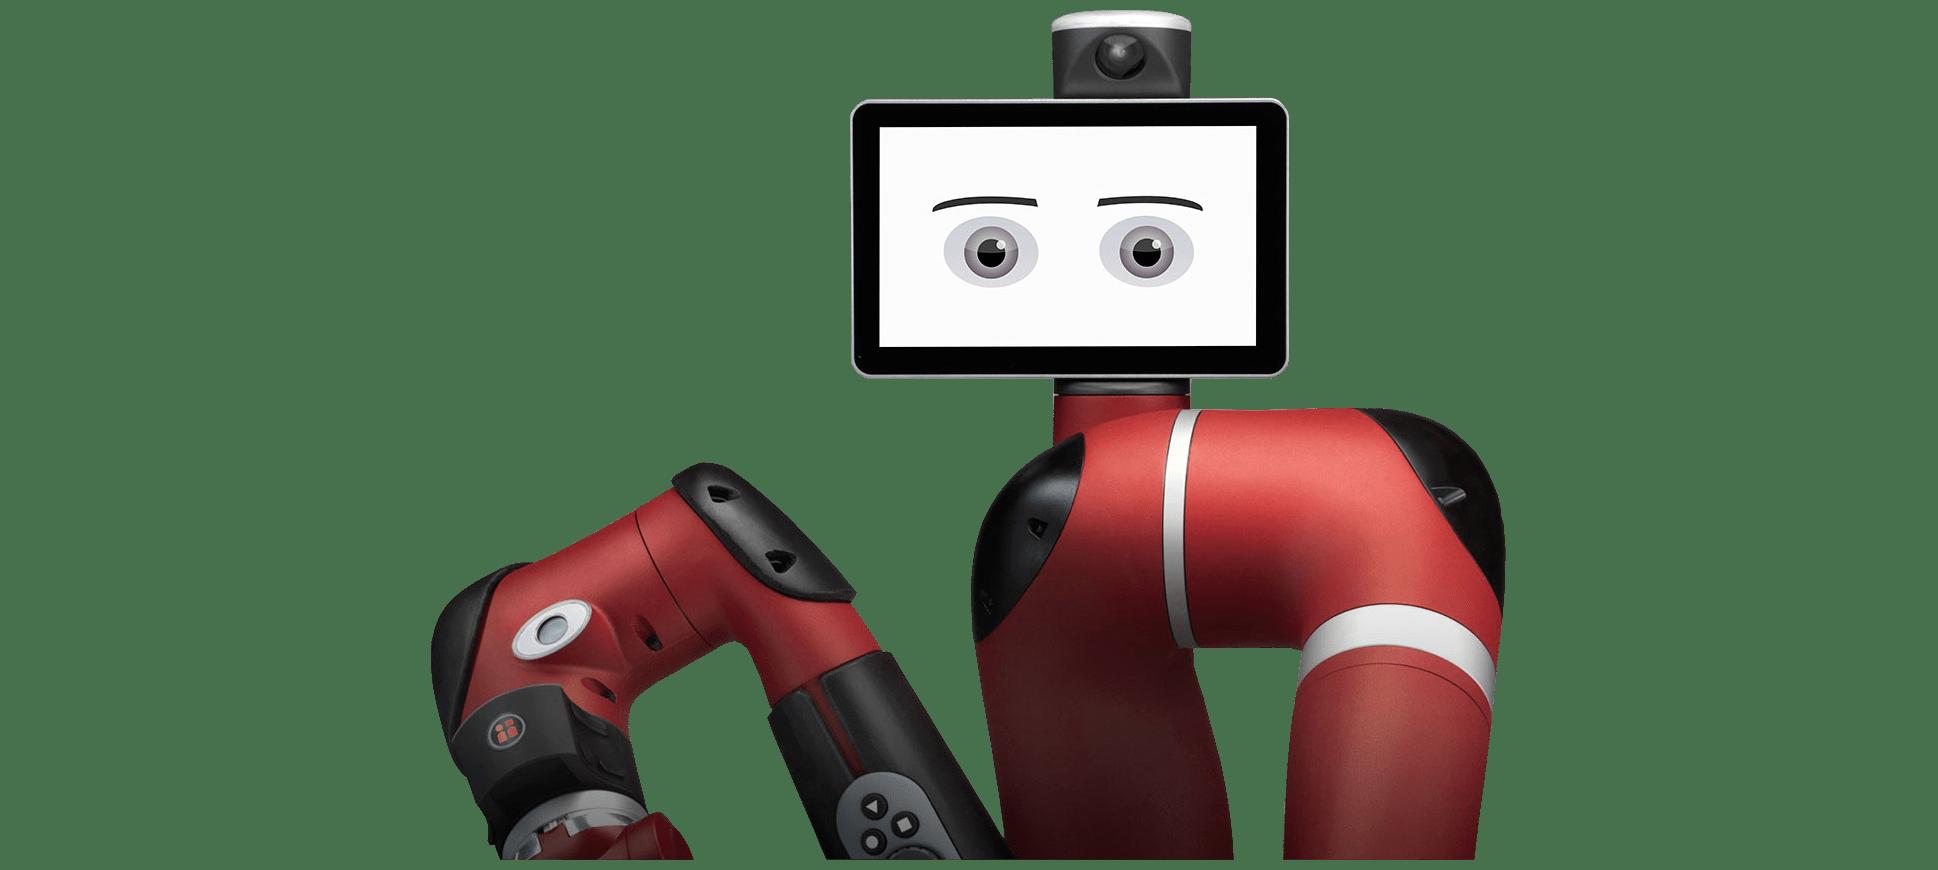 Robot collaboratif Sawyer Humarobotics